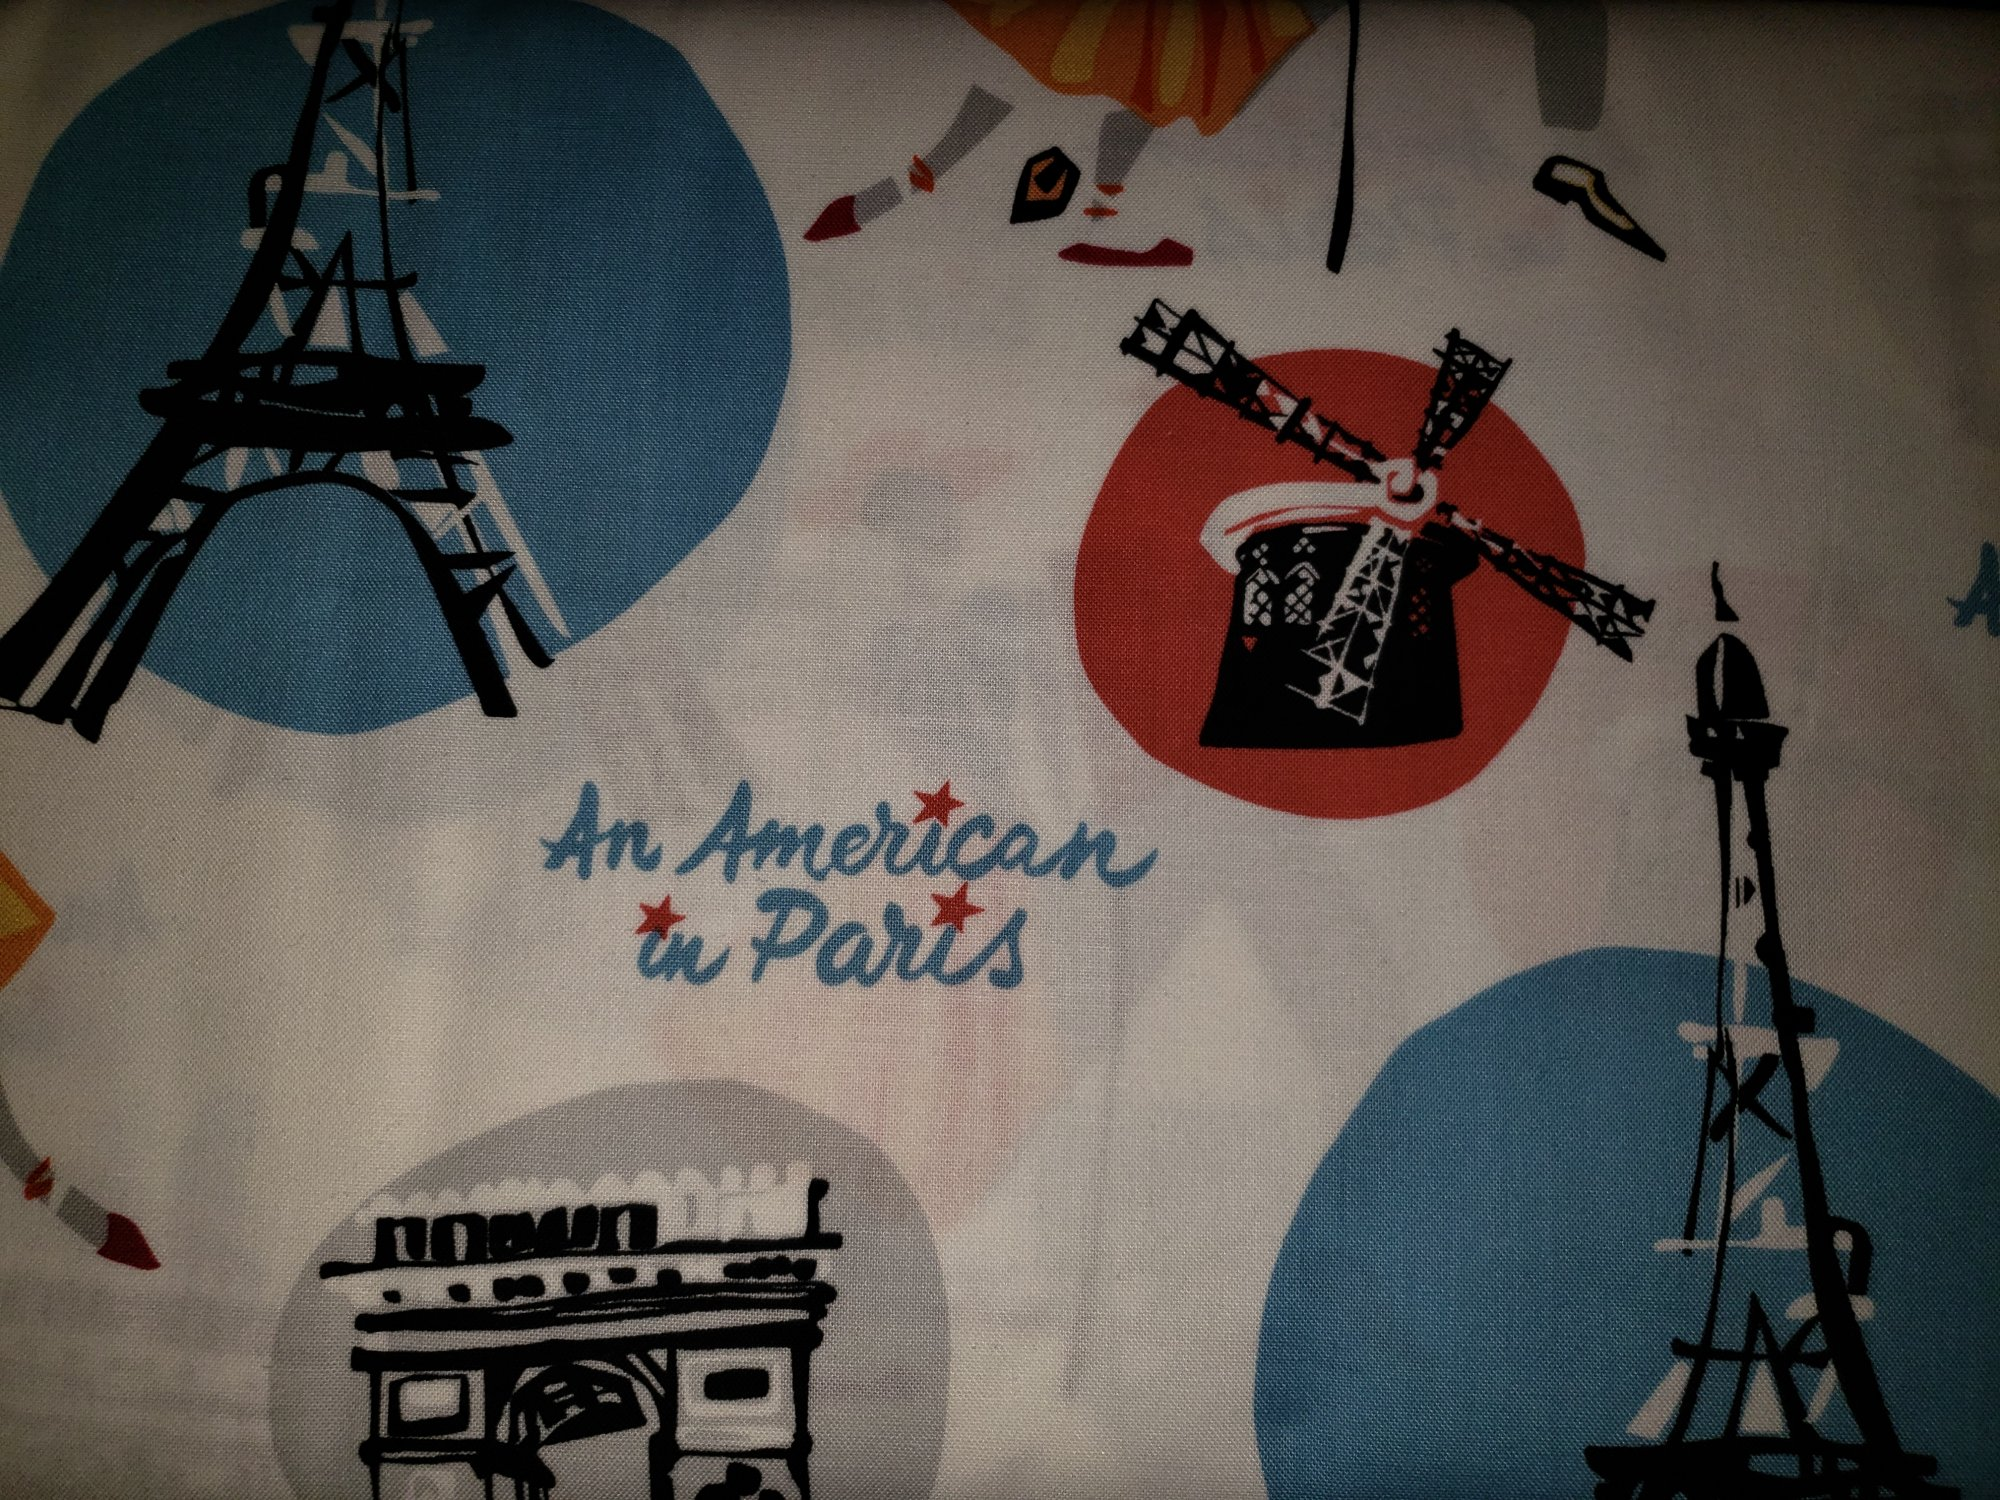 An American In Paris - 8265